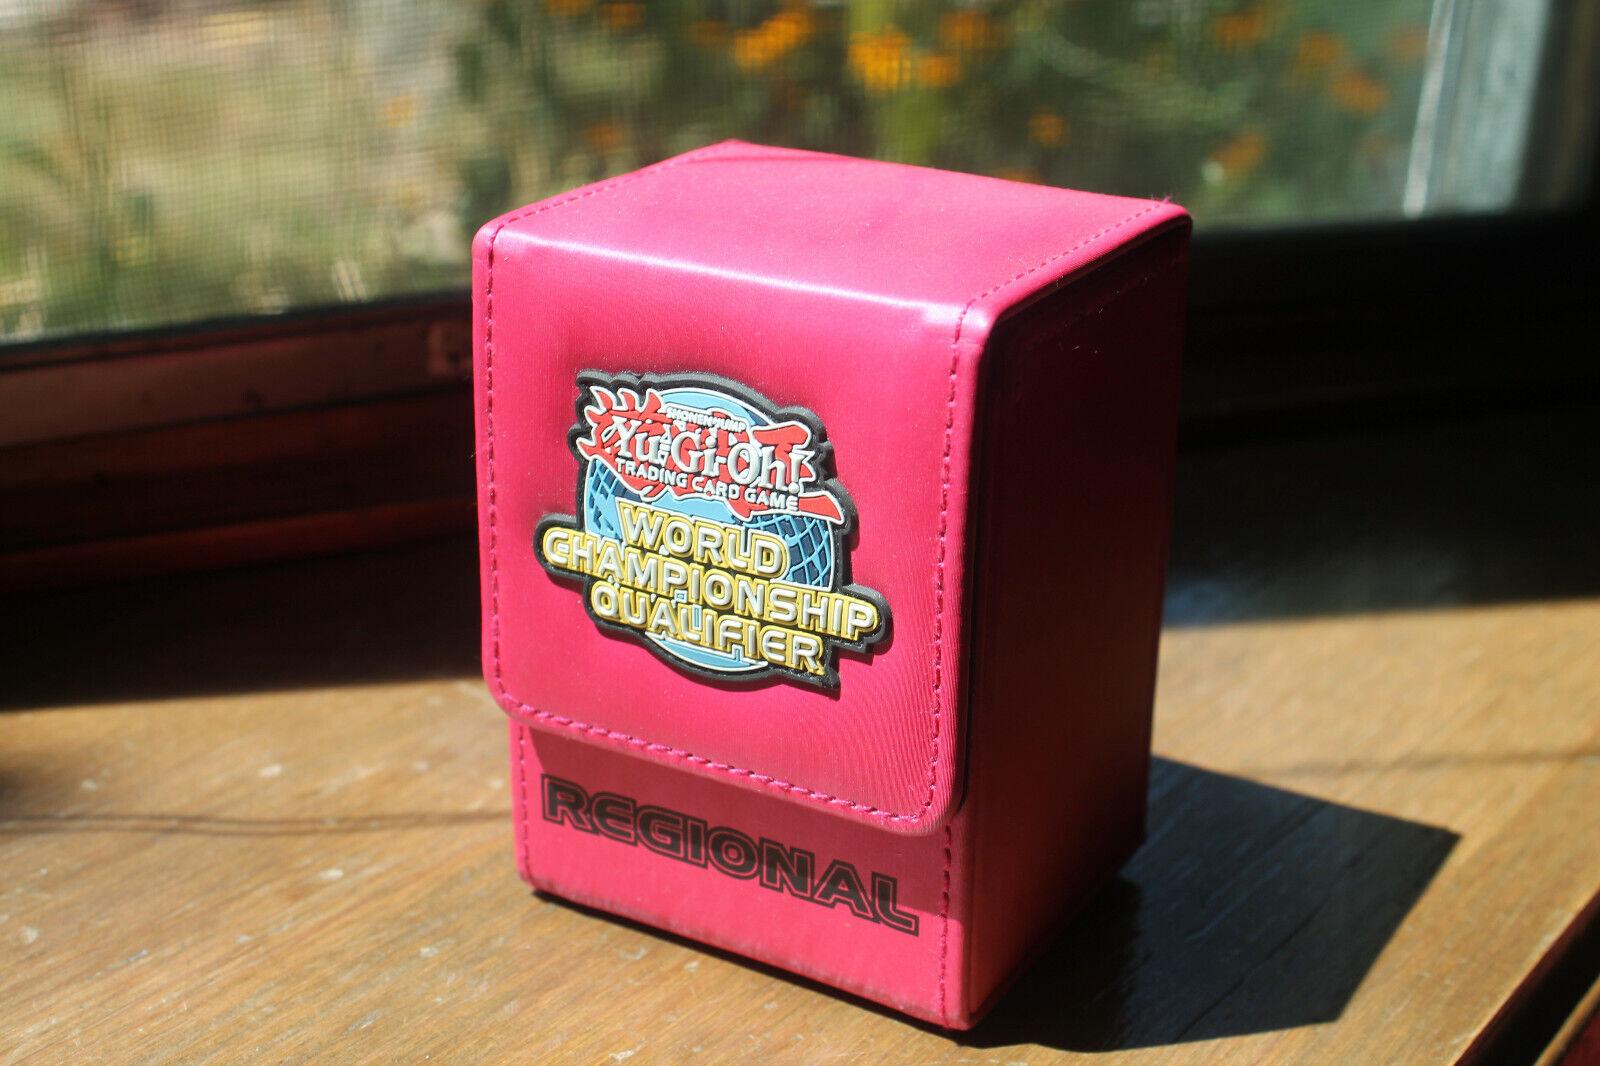 yugioh wcq regional deck box pink not